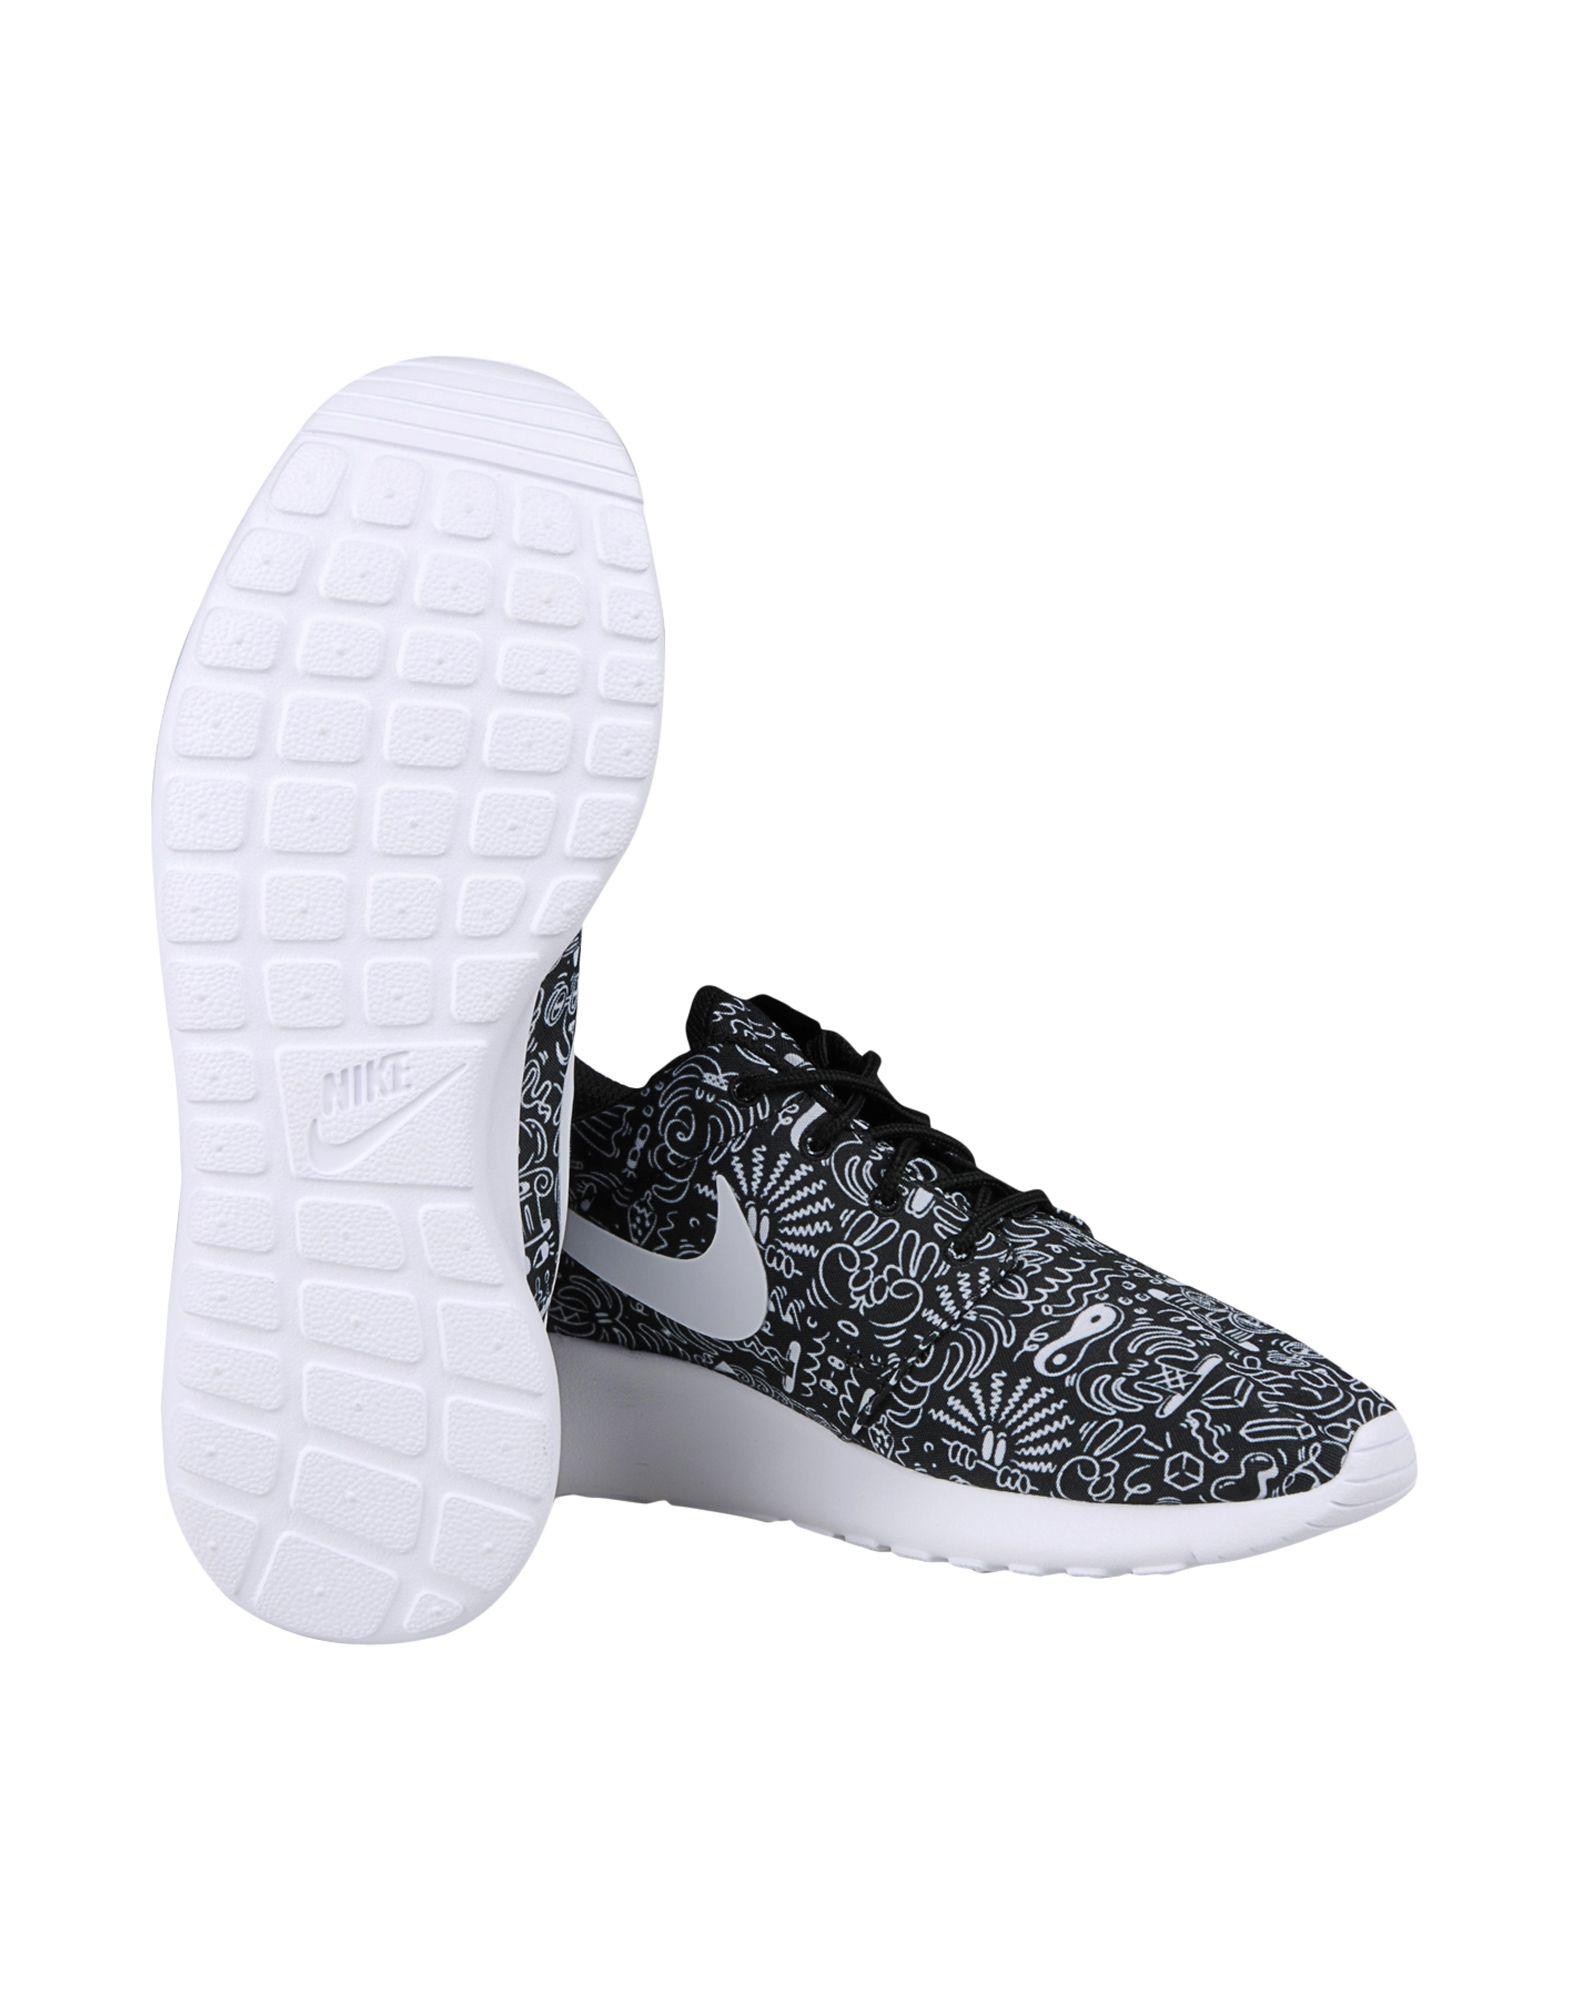 Nike Wmns Nike Roshe One Print Prem  11043984PU Gute Gute Gute Qualität beliebte Schuhe ad763d